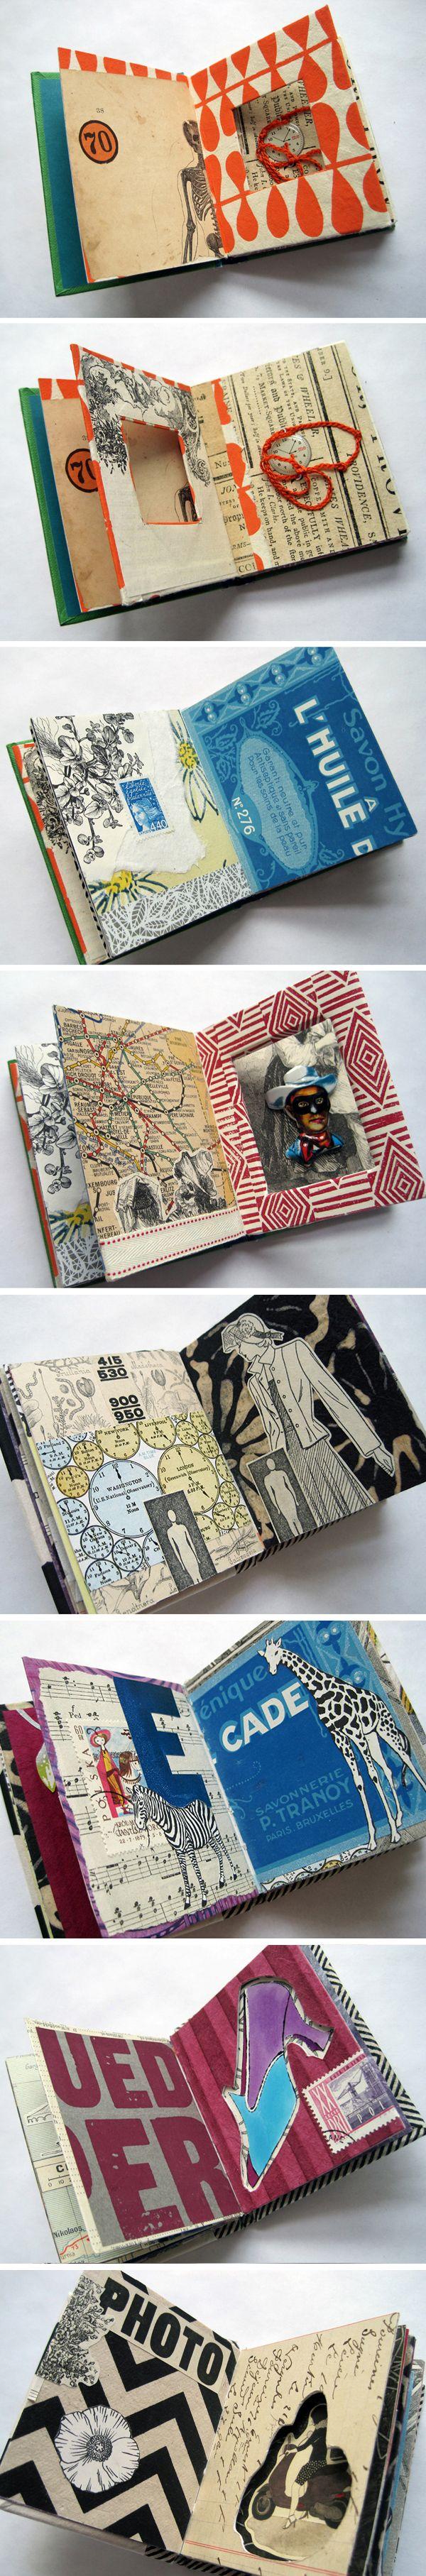 Book Art + Collage by Trish Leavitt, via Behance